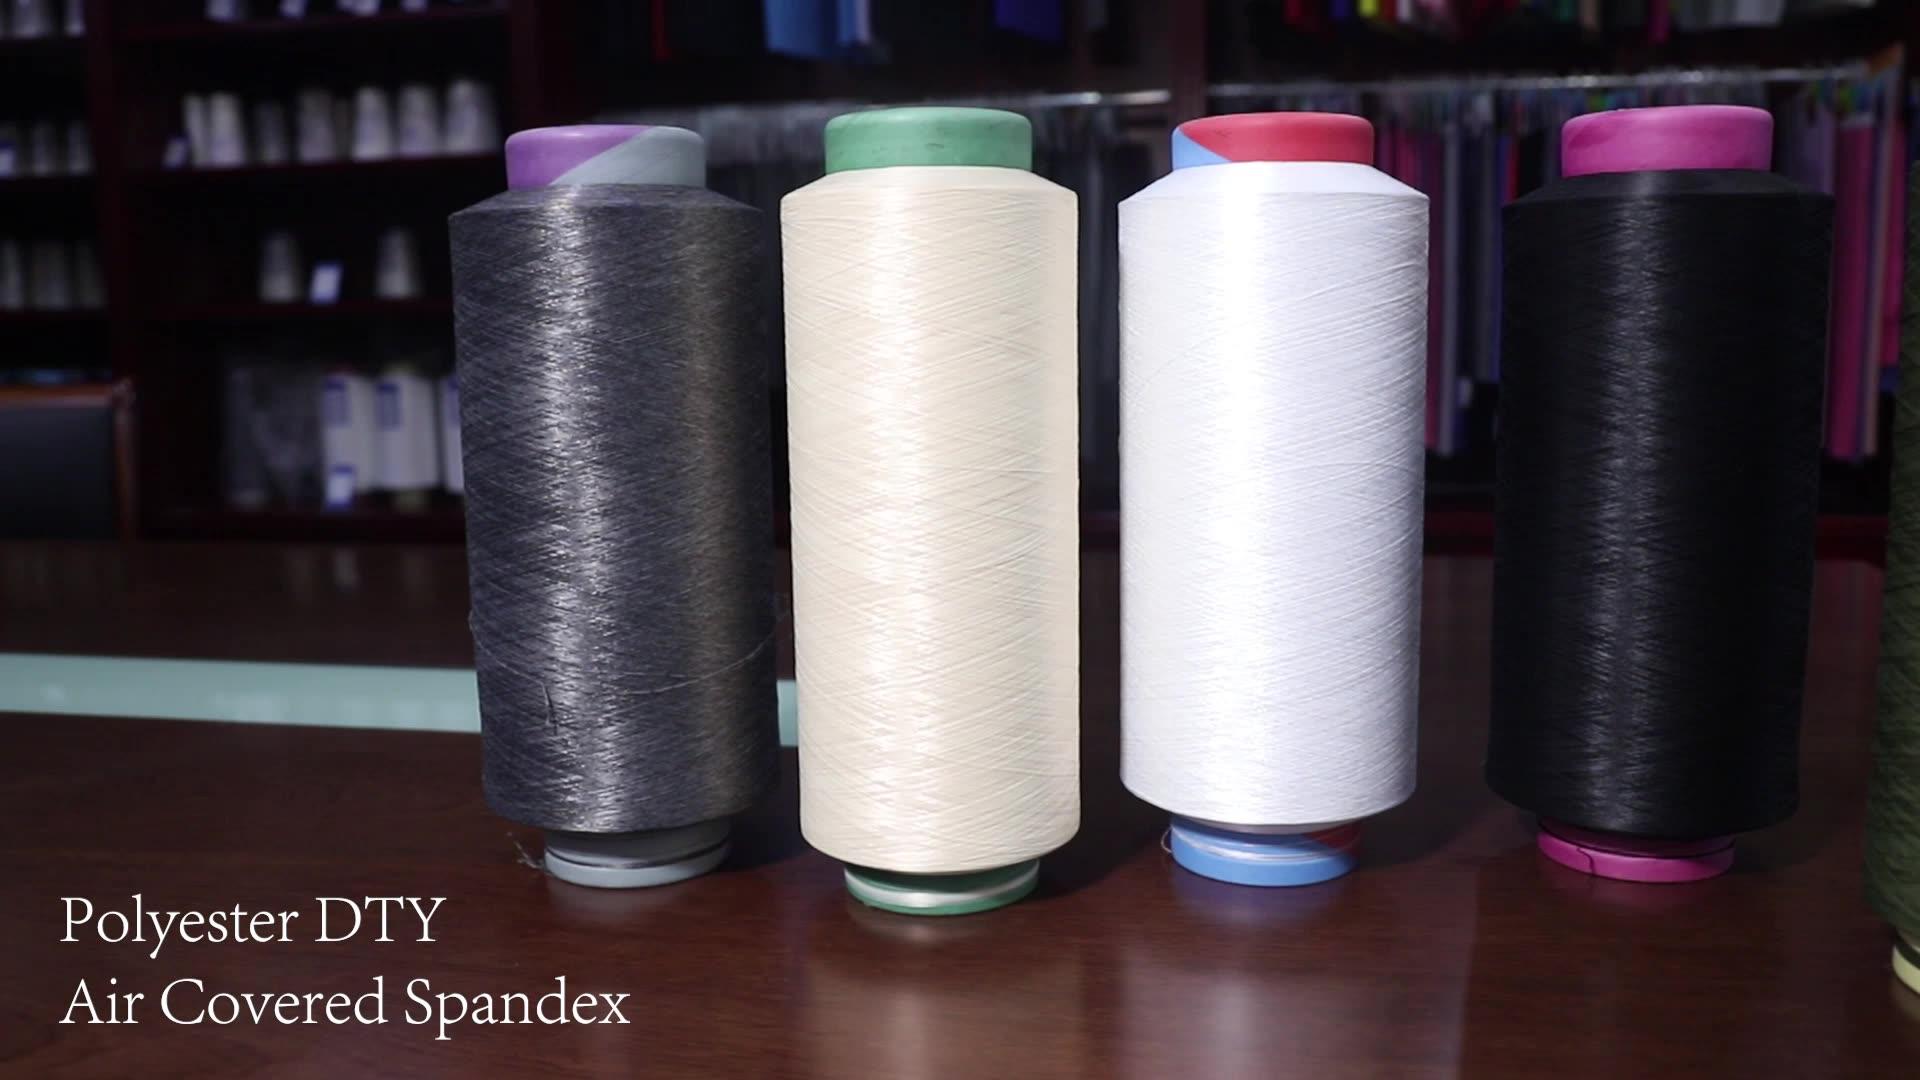 Hot koop hoge kwaliteit gerecycled gesponnen bulk 100 polyester garen markt in china